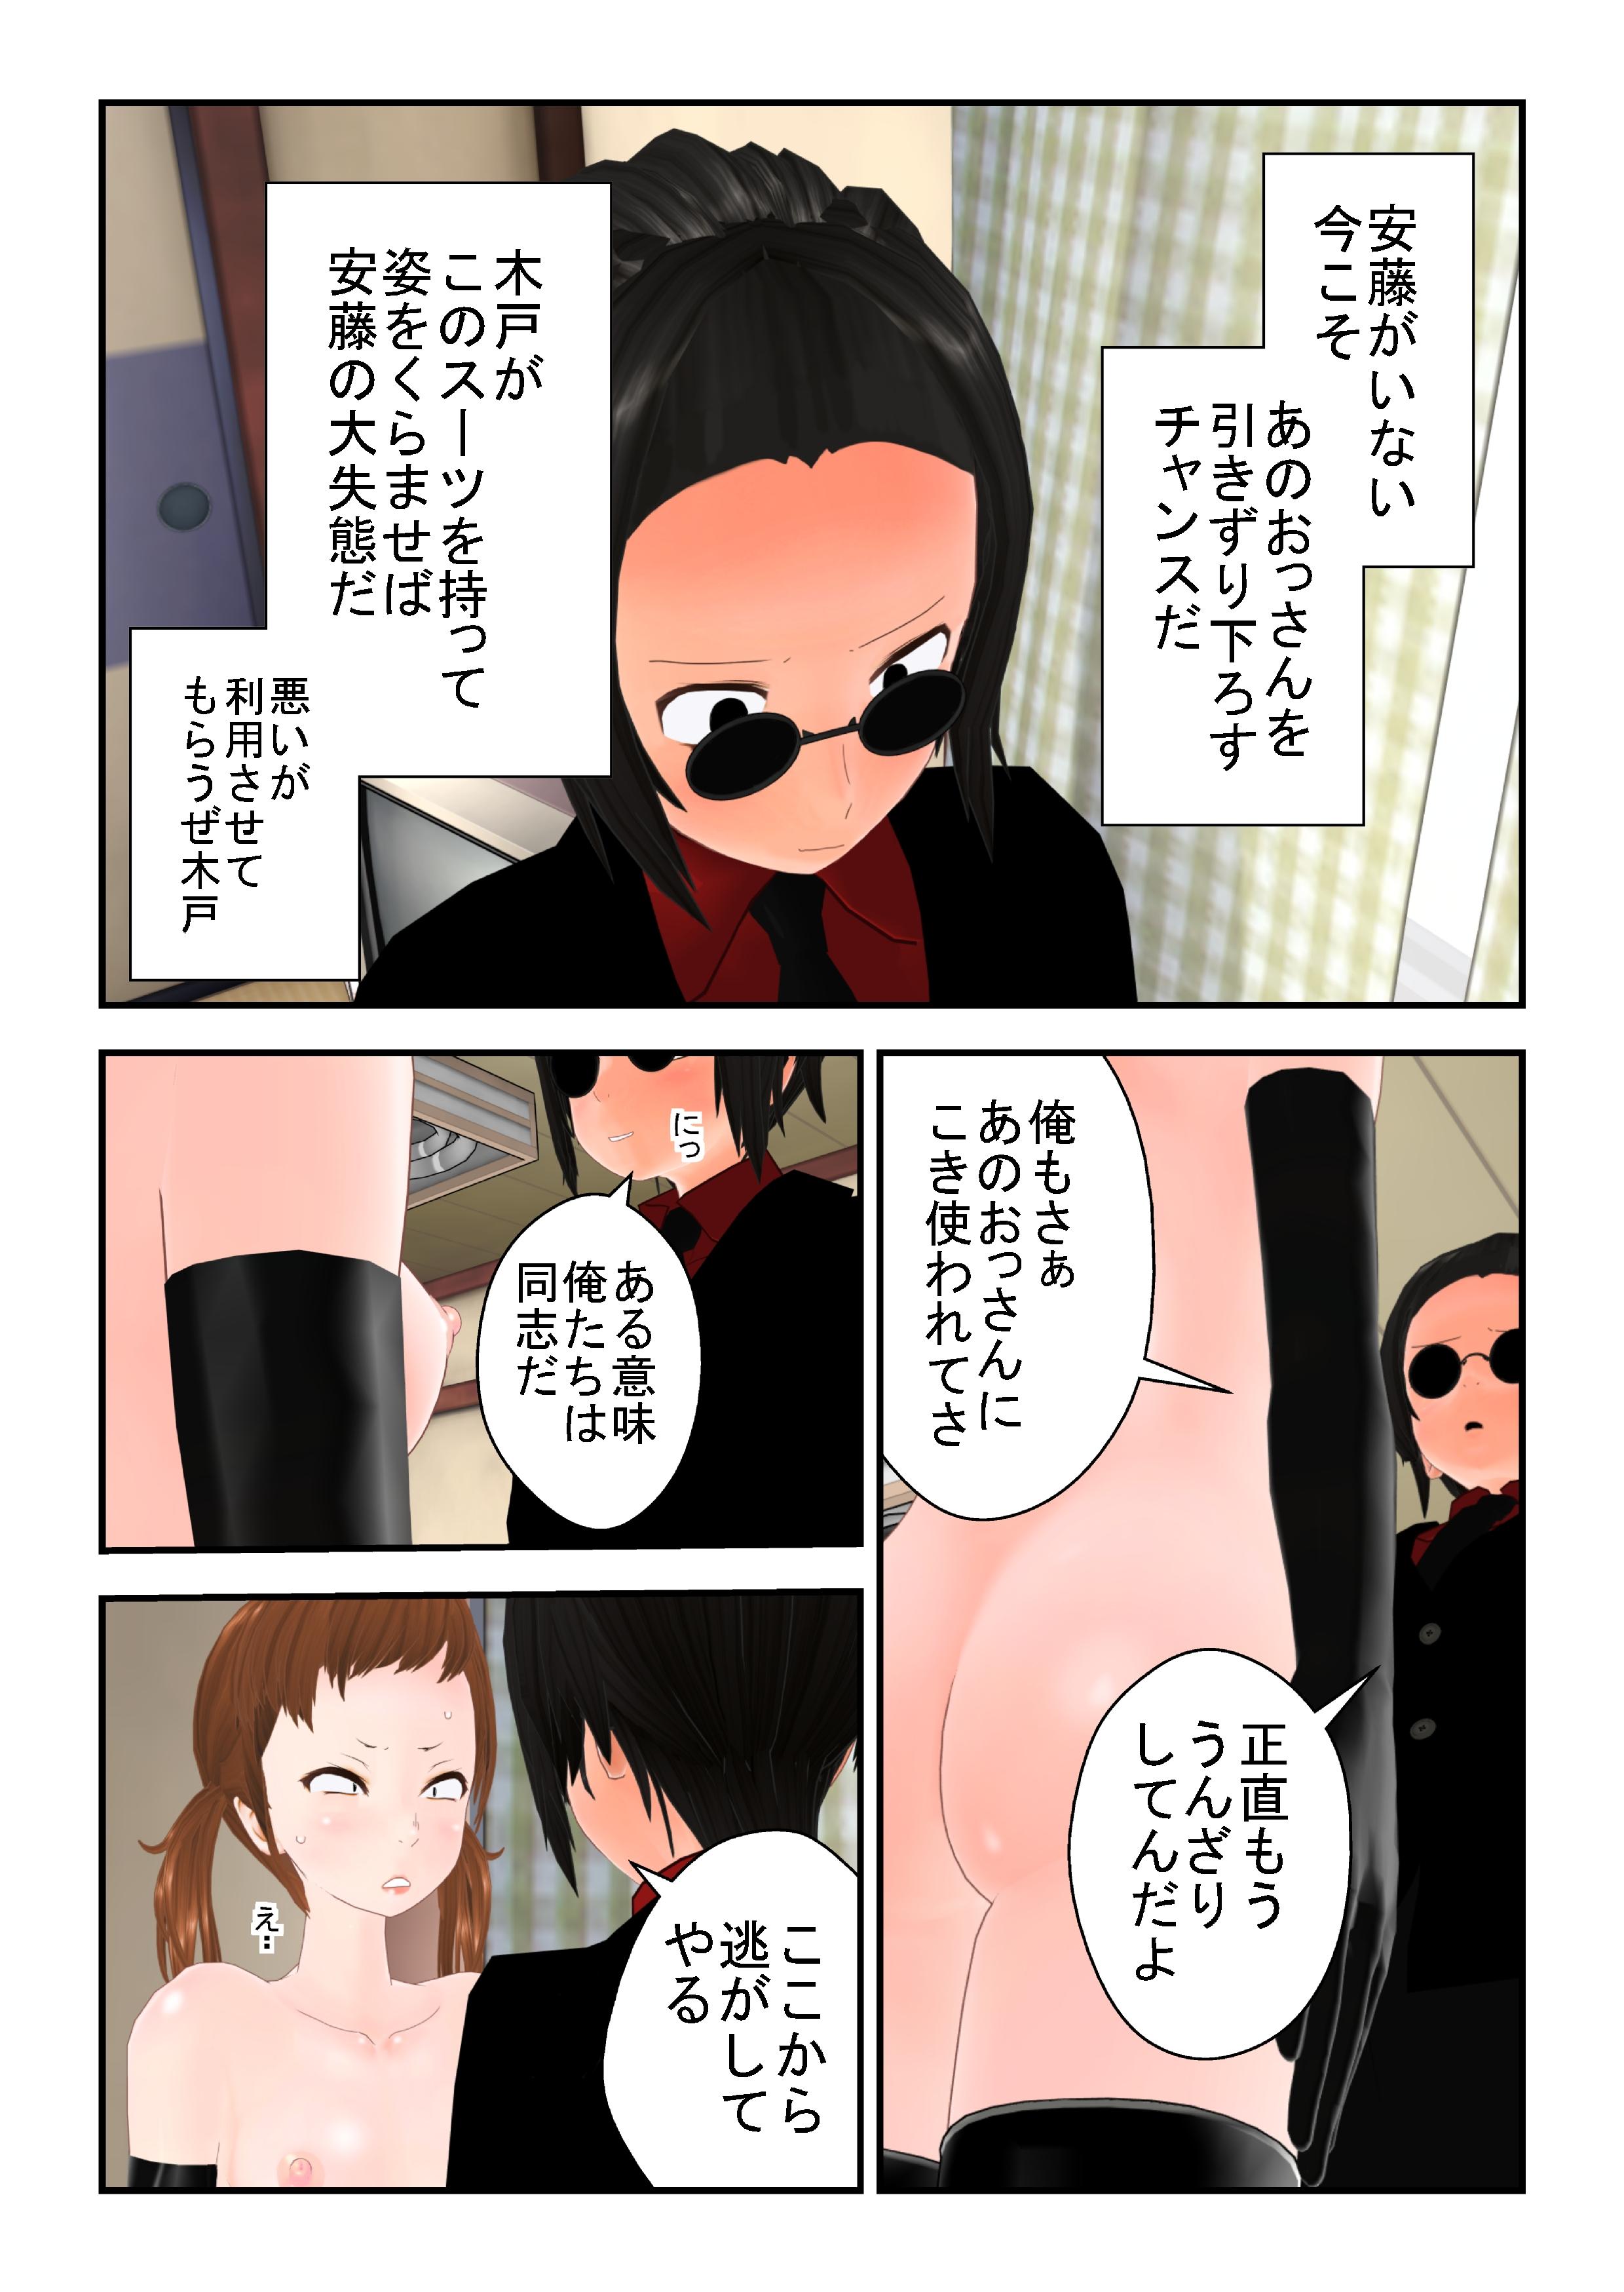 shi_0042.jpg